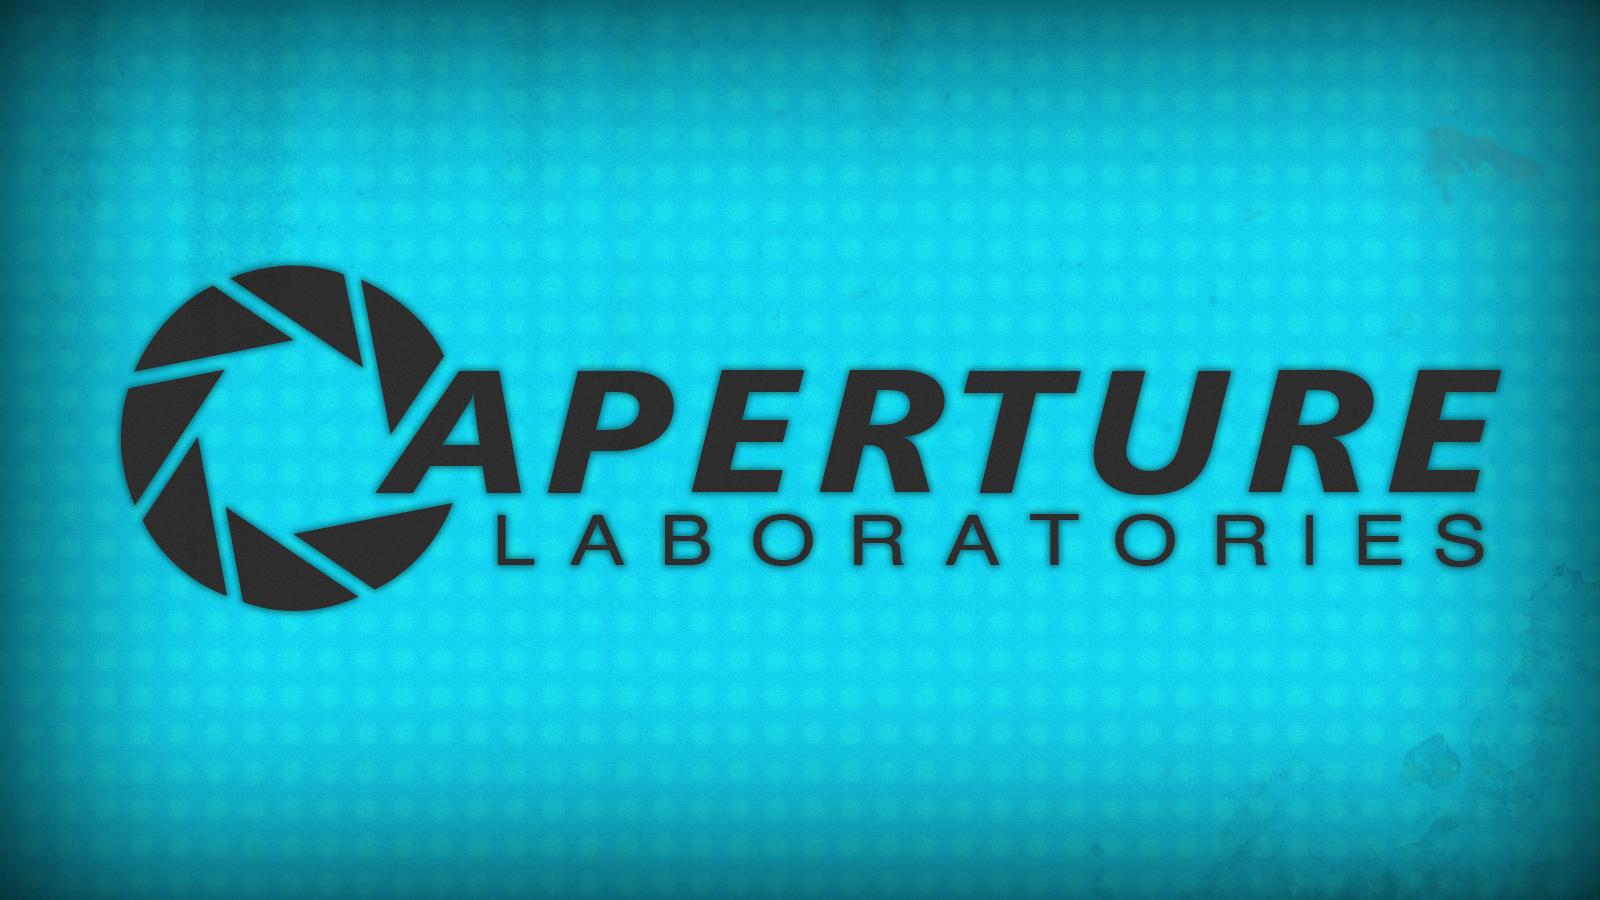 aperture laboratoriesdavidthedestroyer on deviantart